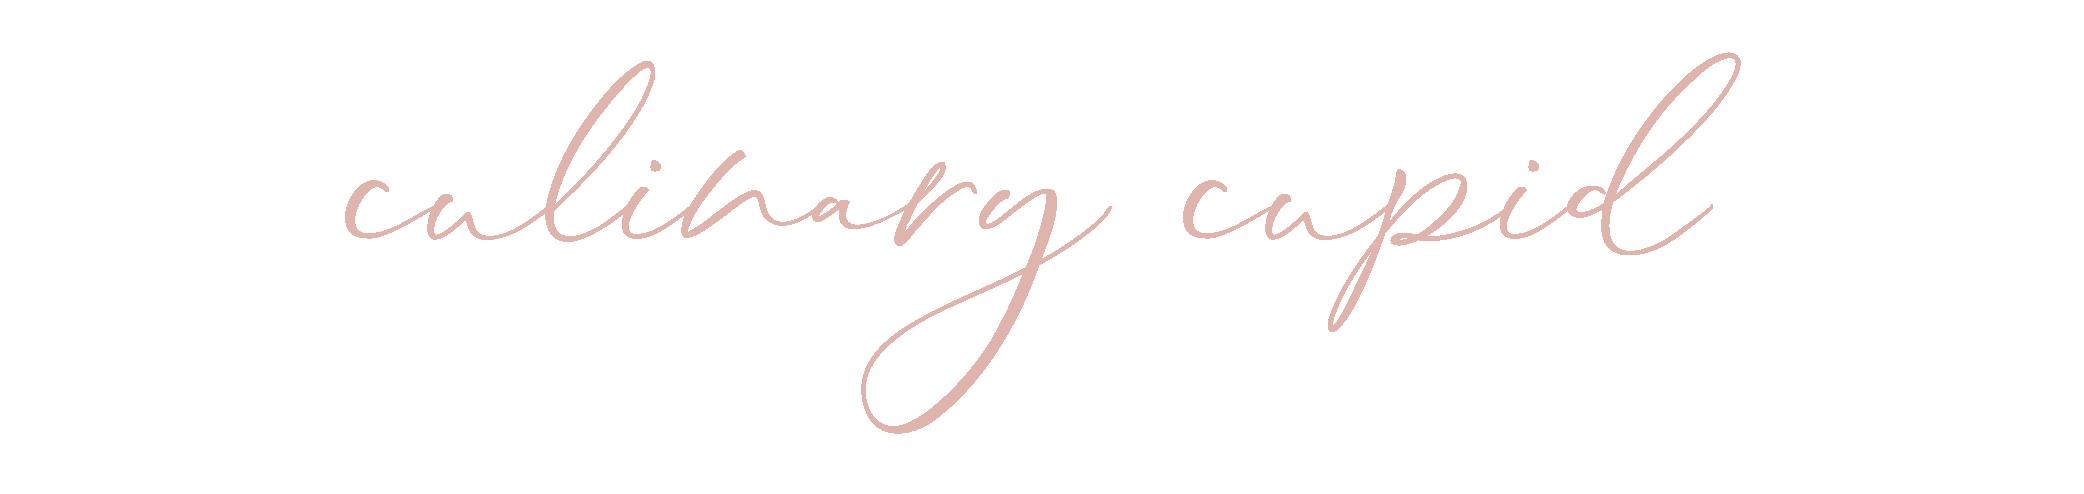 Culinary Cupid